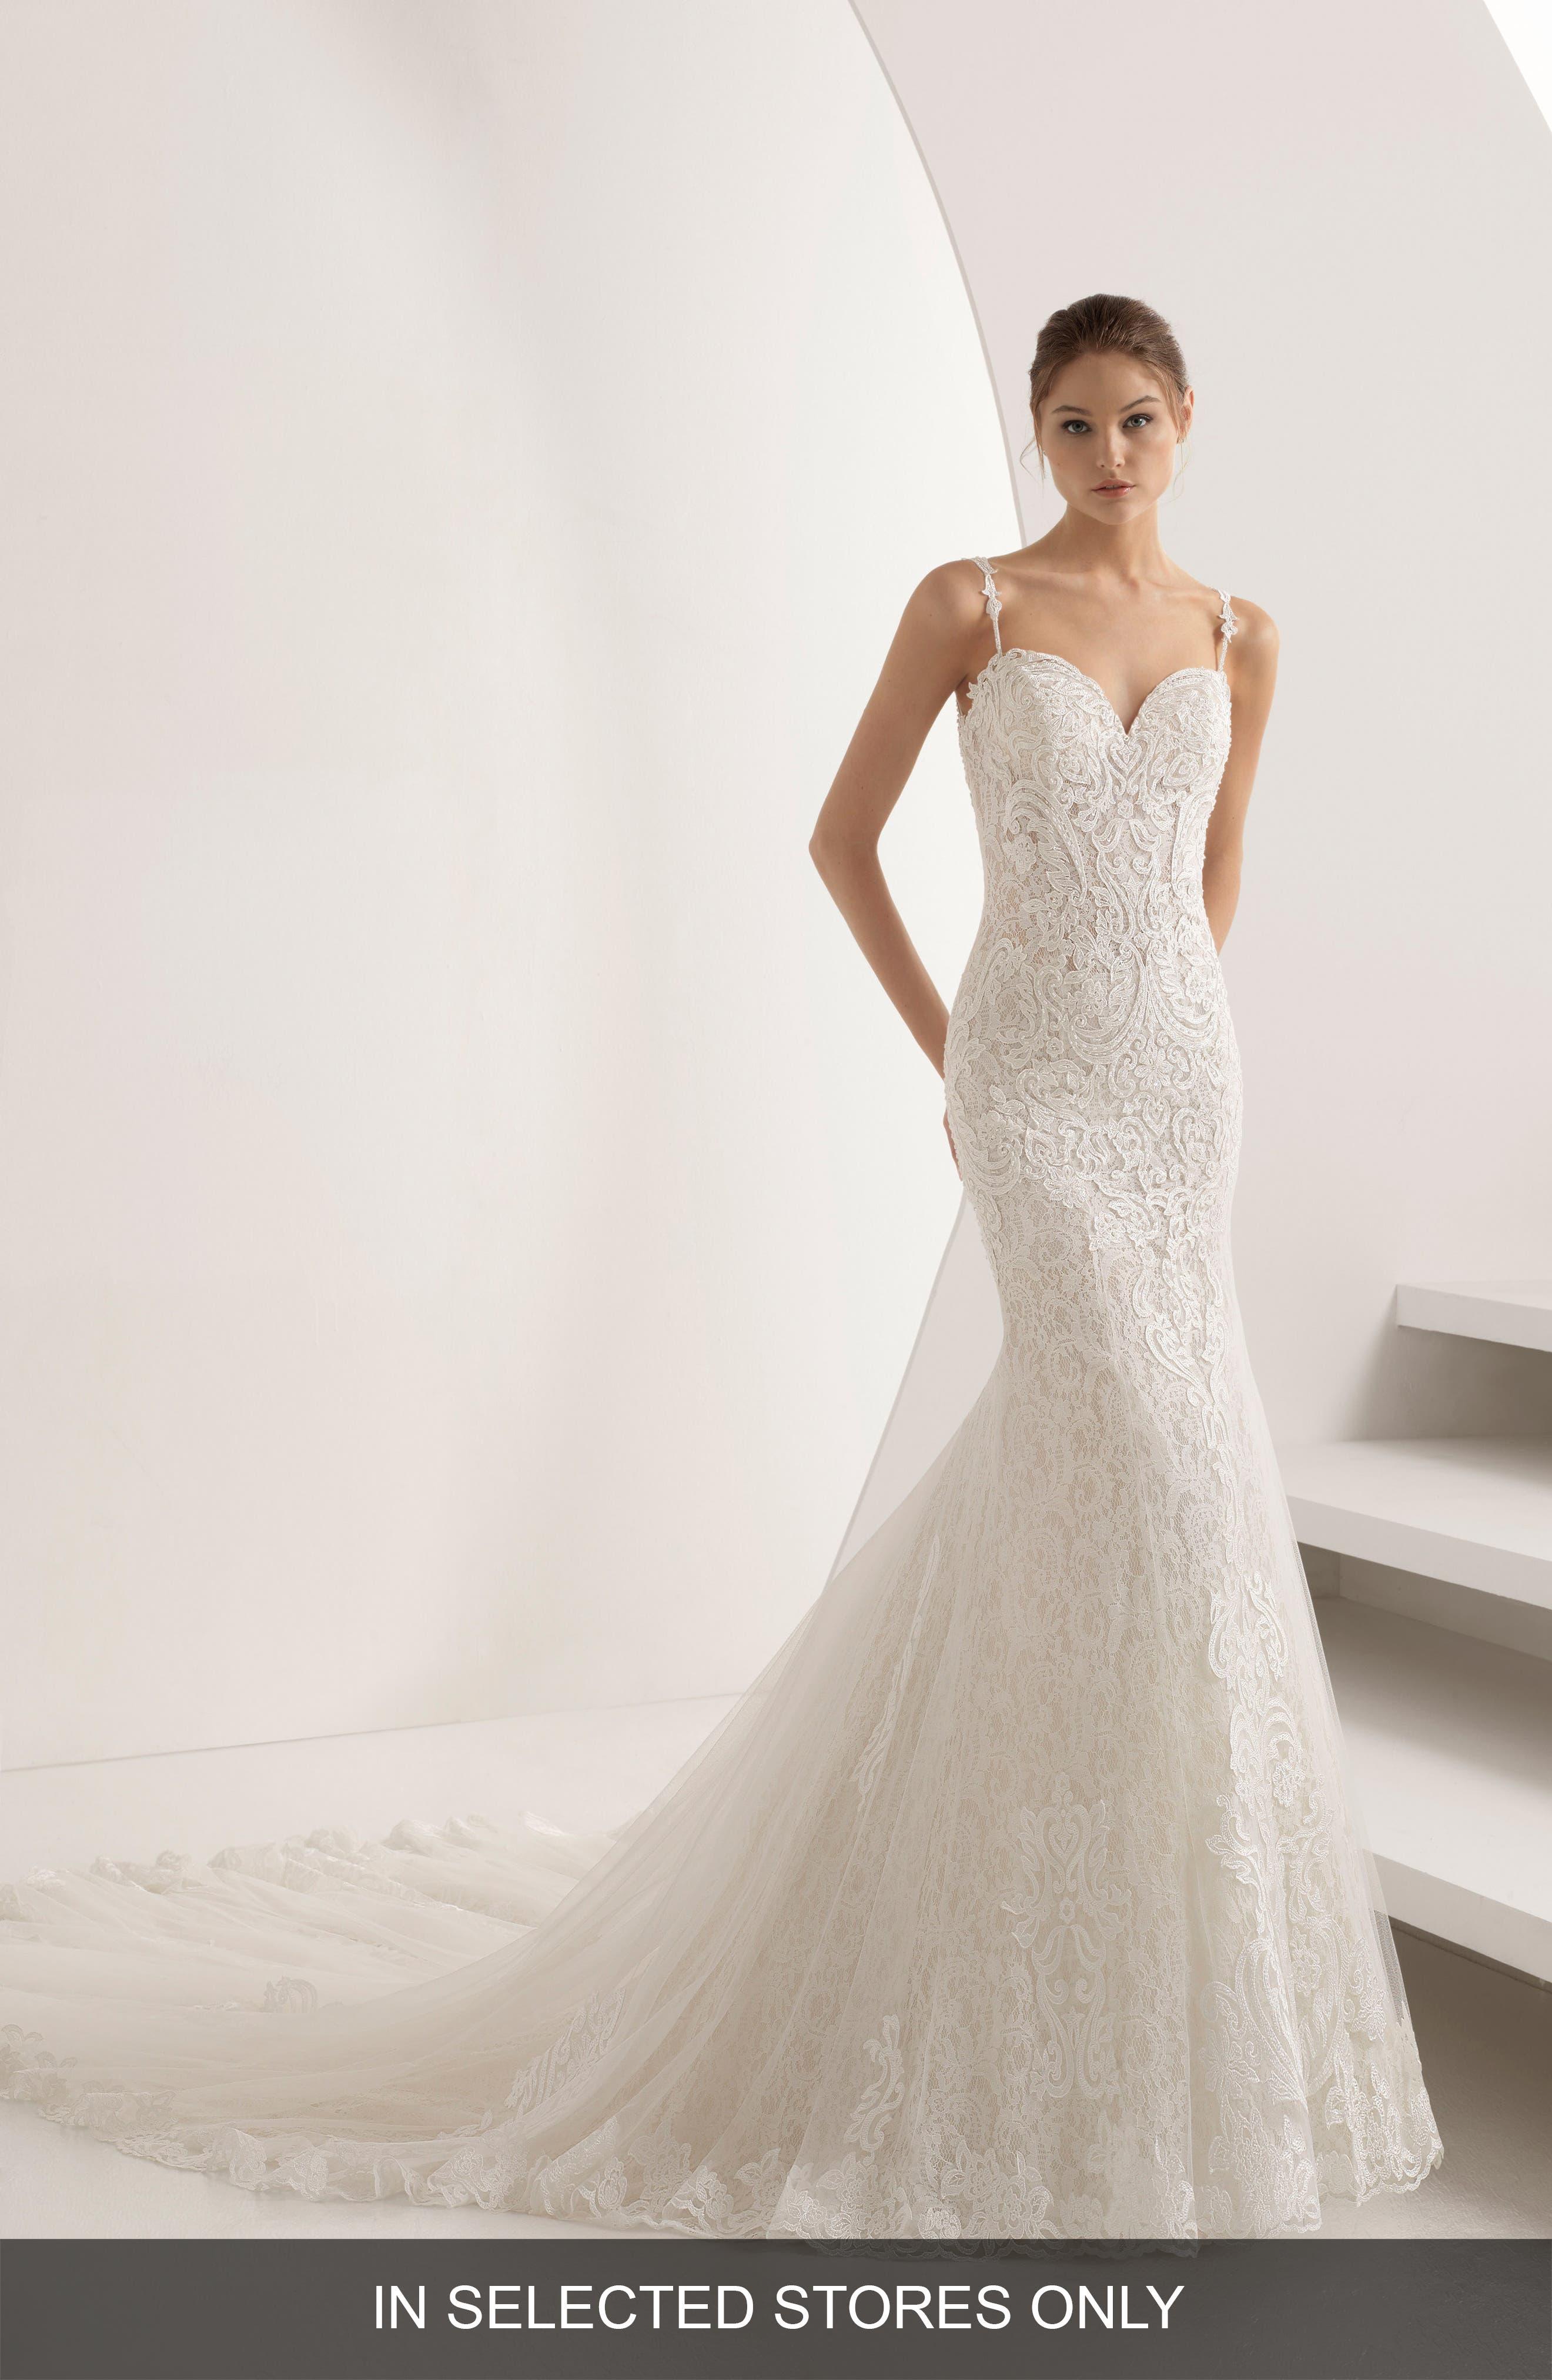 Rosa Clara Wedding Dresses & Bridal Gowns | Nordstrom